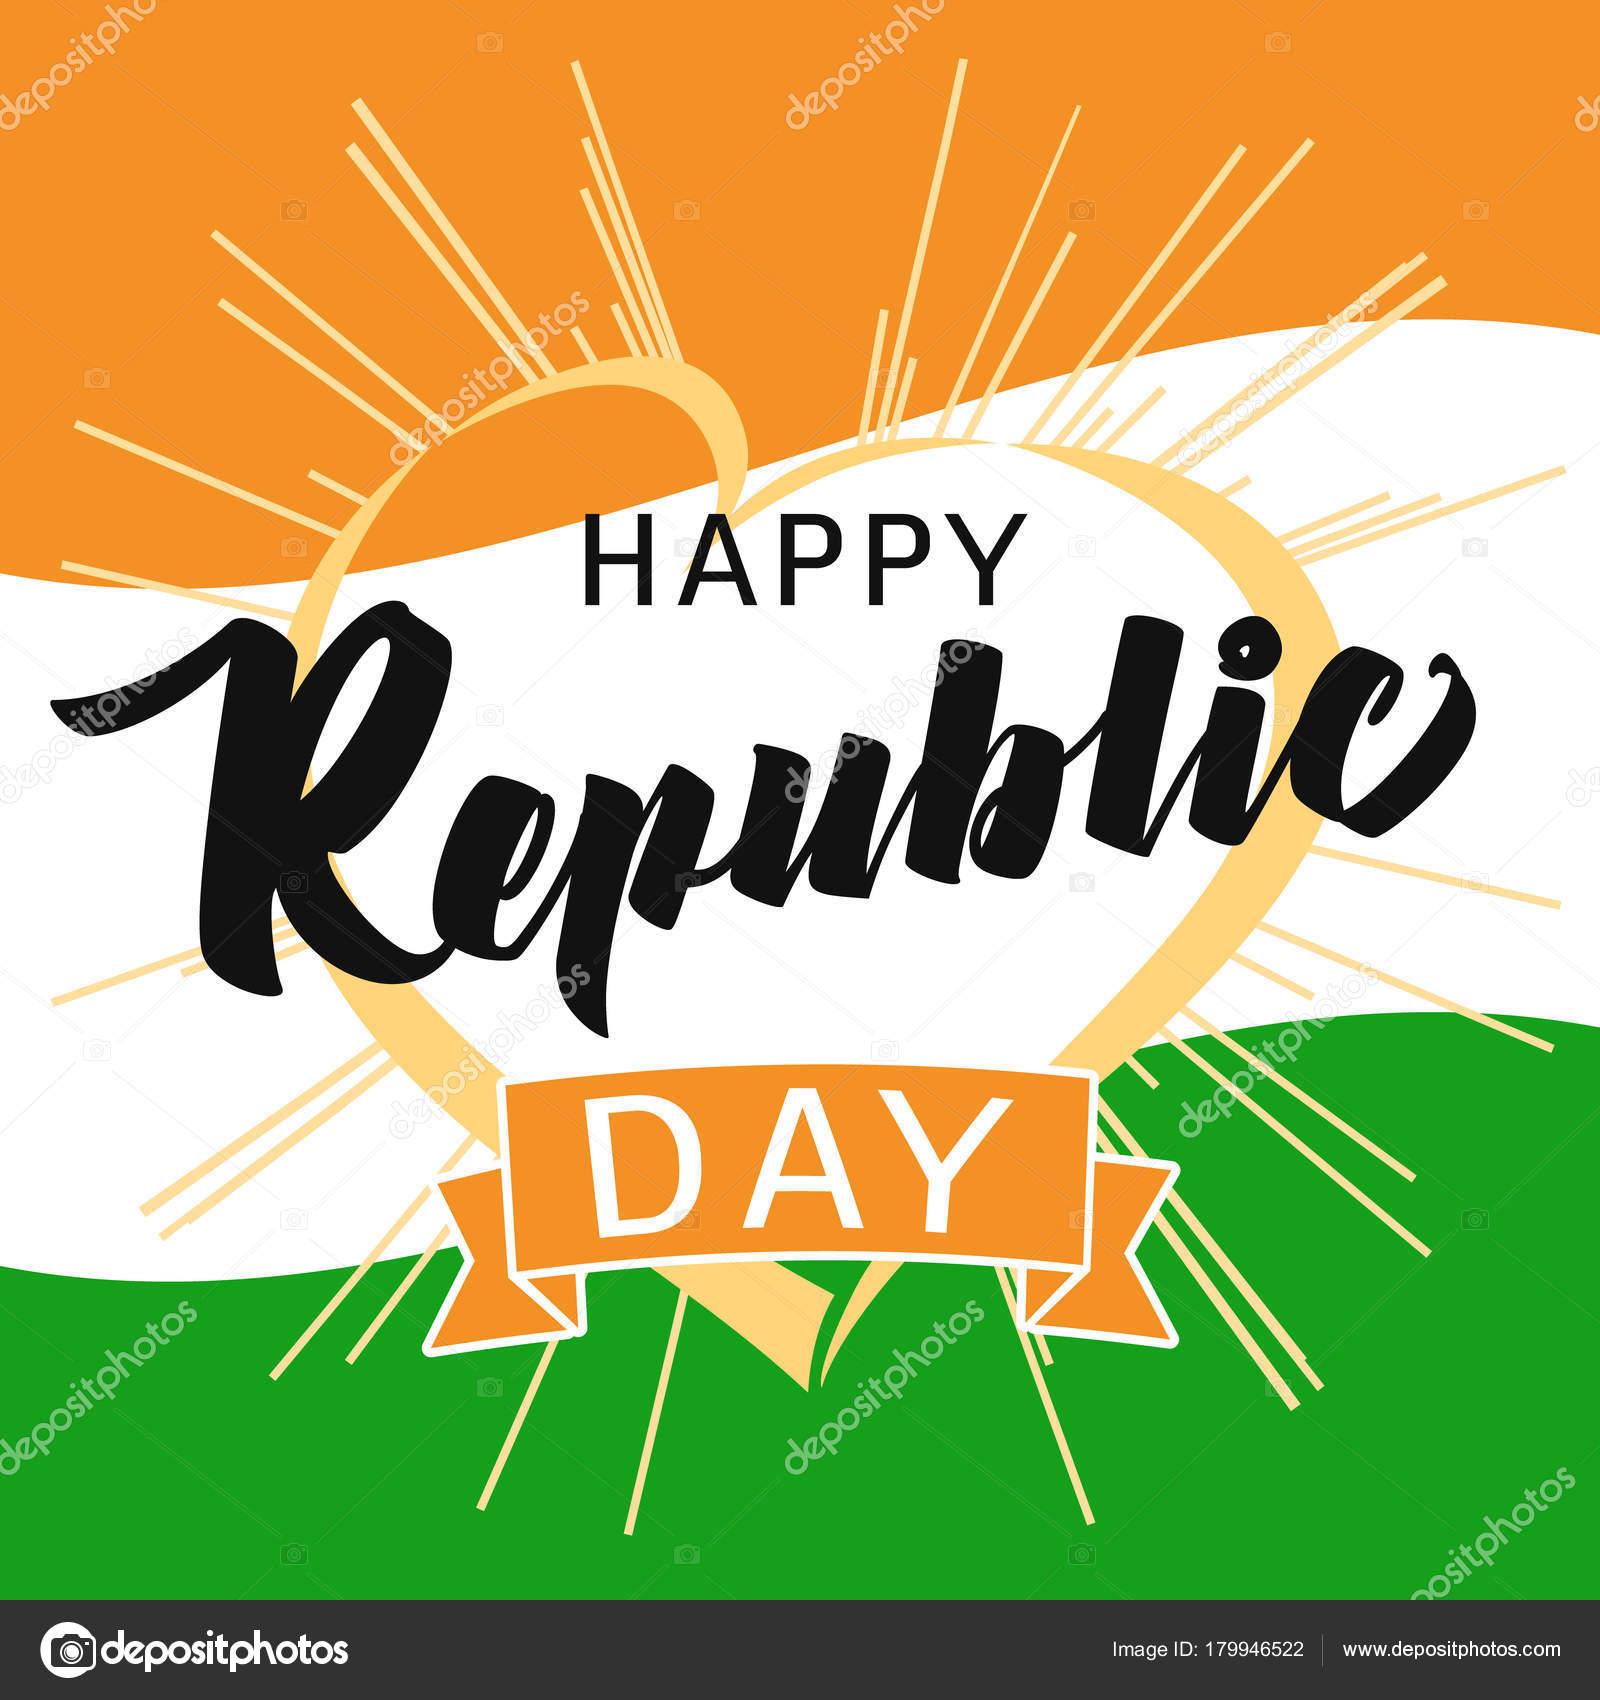 Happy republic day idia heart beams greeting card national flag happy republic day idia heart beams greeting card national flag stock vector m4hsunfo